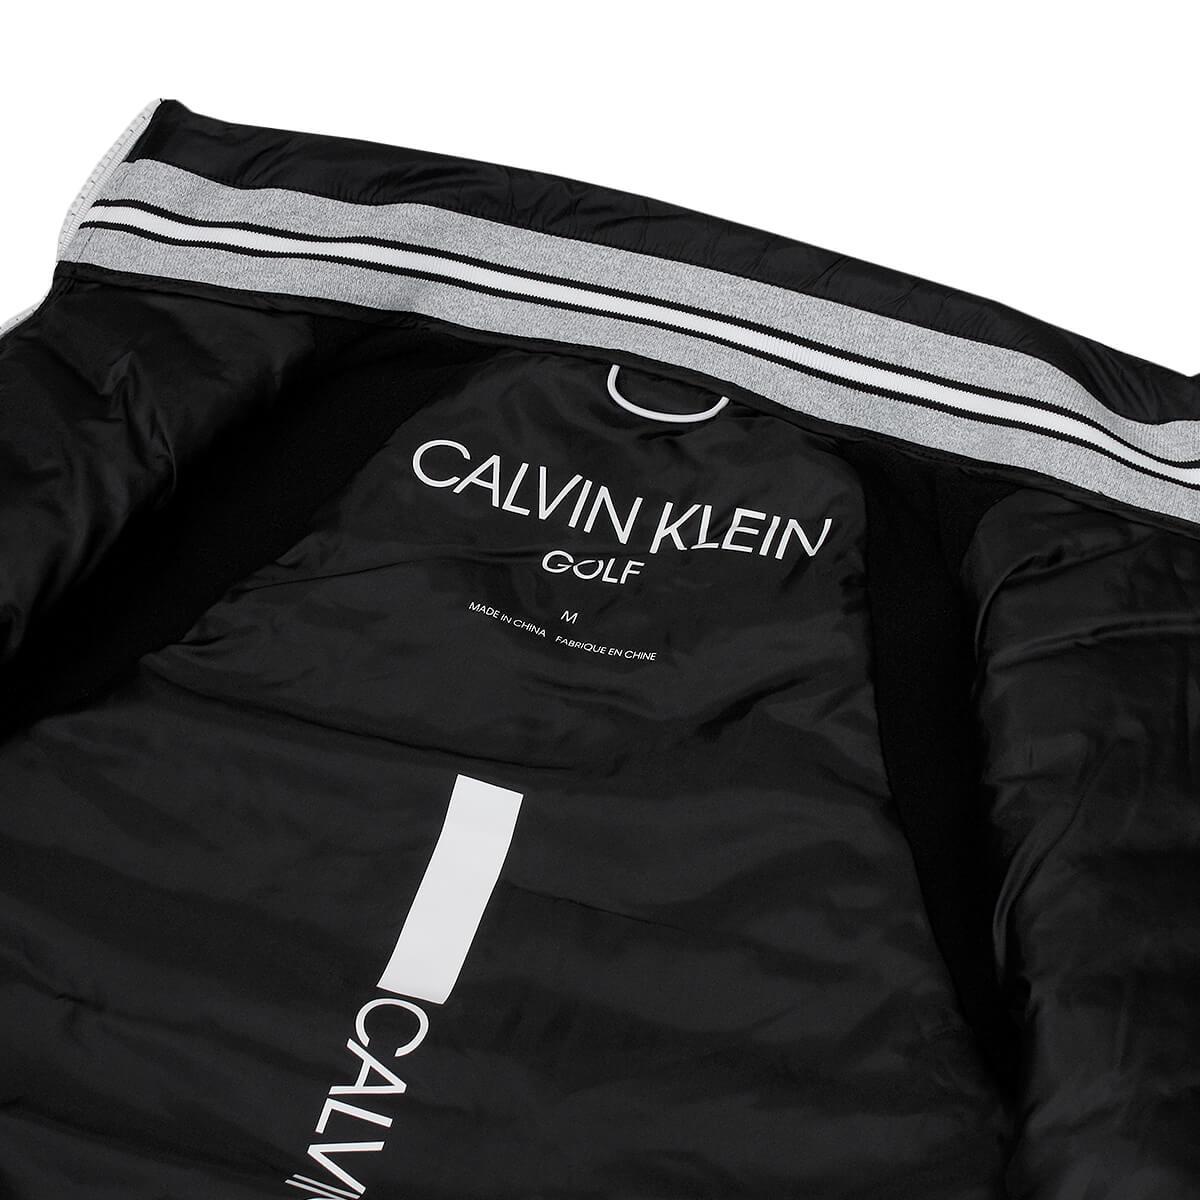 Calvin-Klein-Mens-2020-Hybrid-Insulate-Lightweight-Bodywarmer-Gilet-31-OFF-RRP thumbnail 4